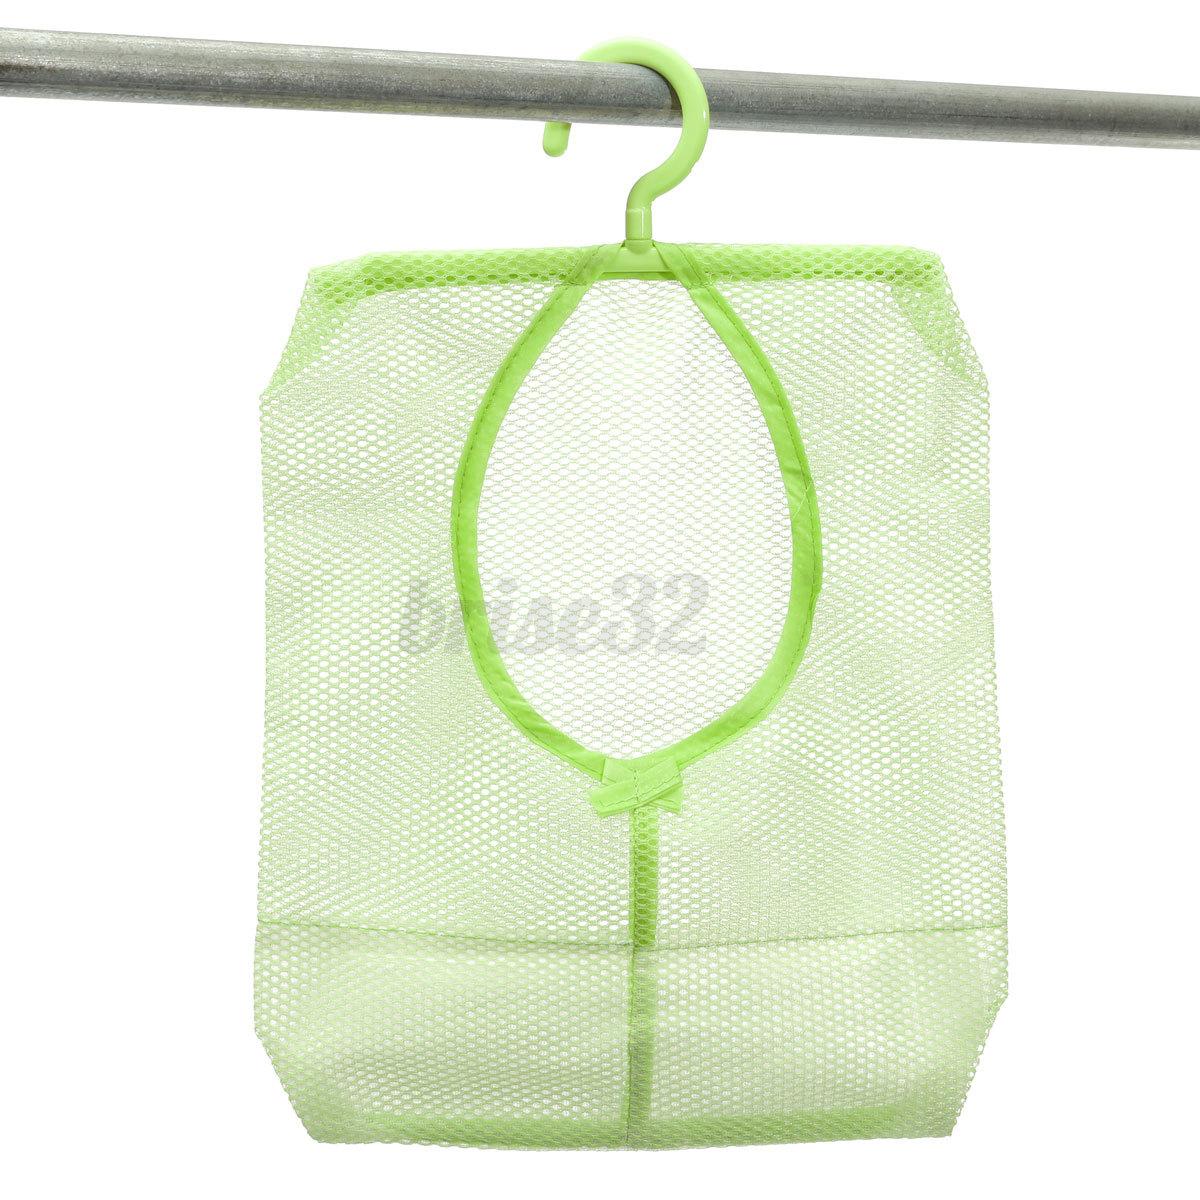 New Foldable Pop Up Washing Clothes Laundry Basket Bag Bin Hamper Mesh Storage Ebay